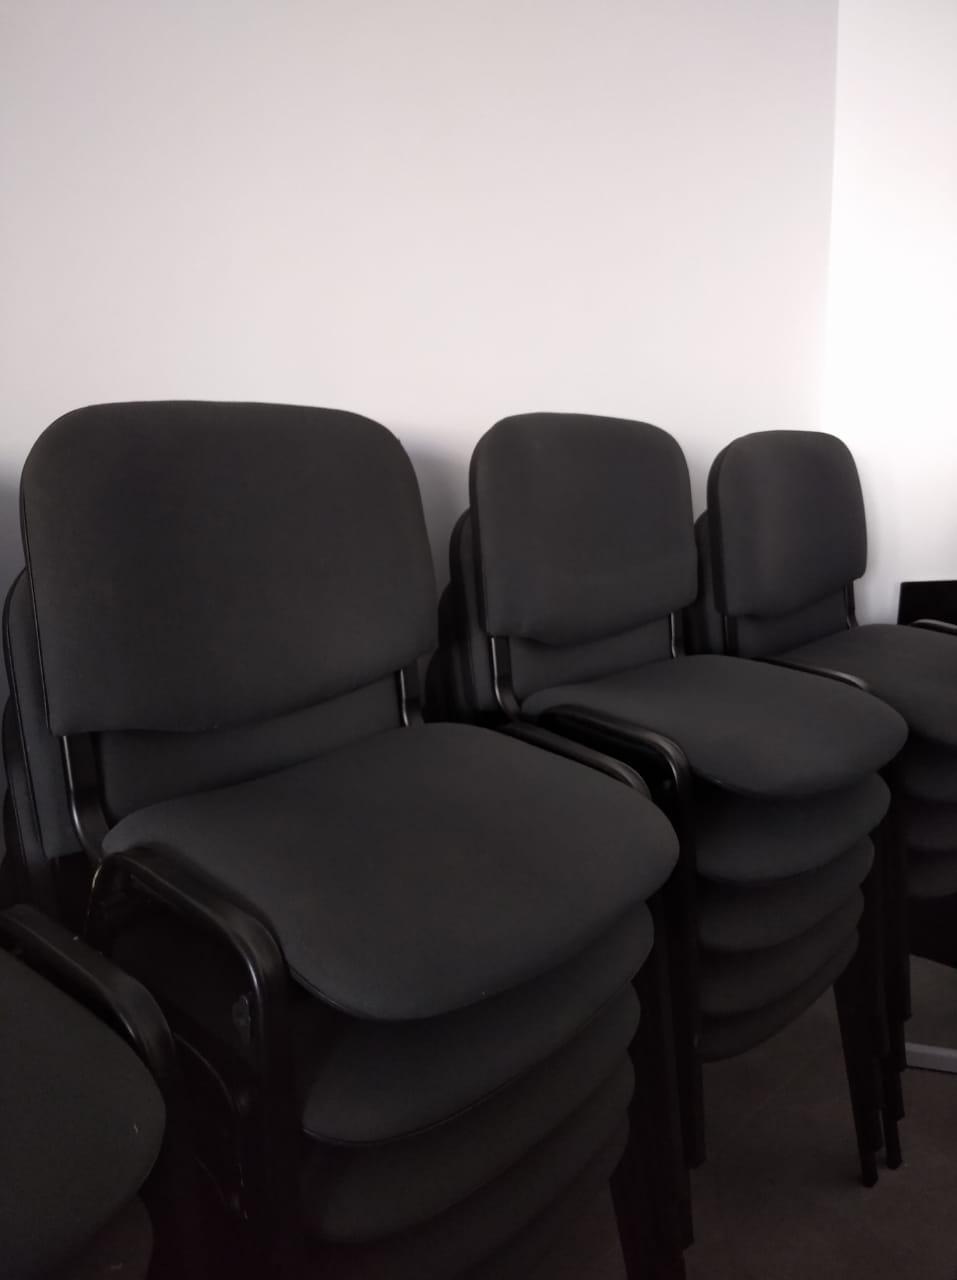 Lot 10 chaise visiteur iso